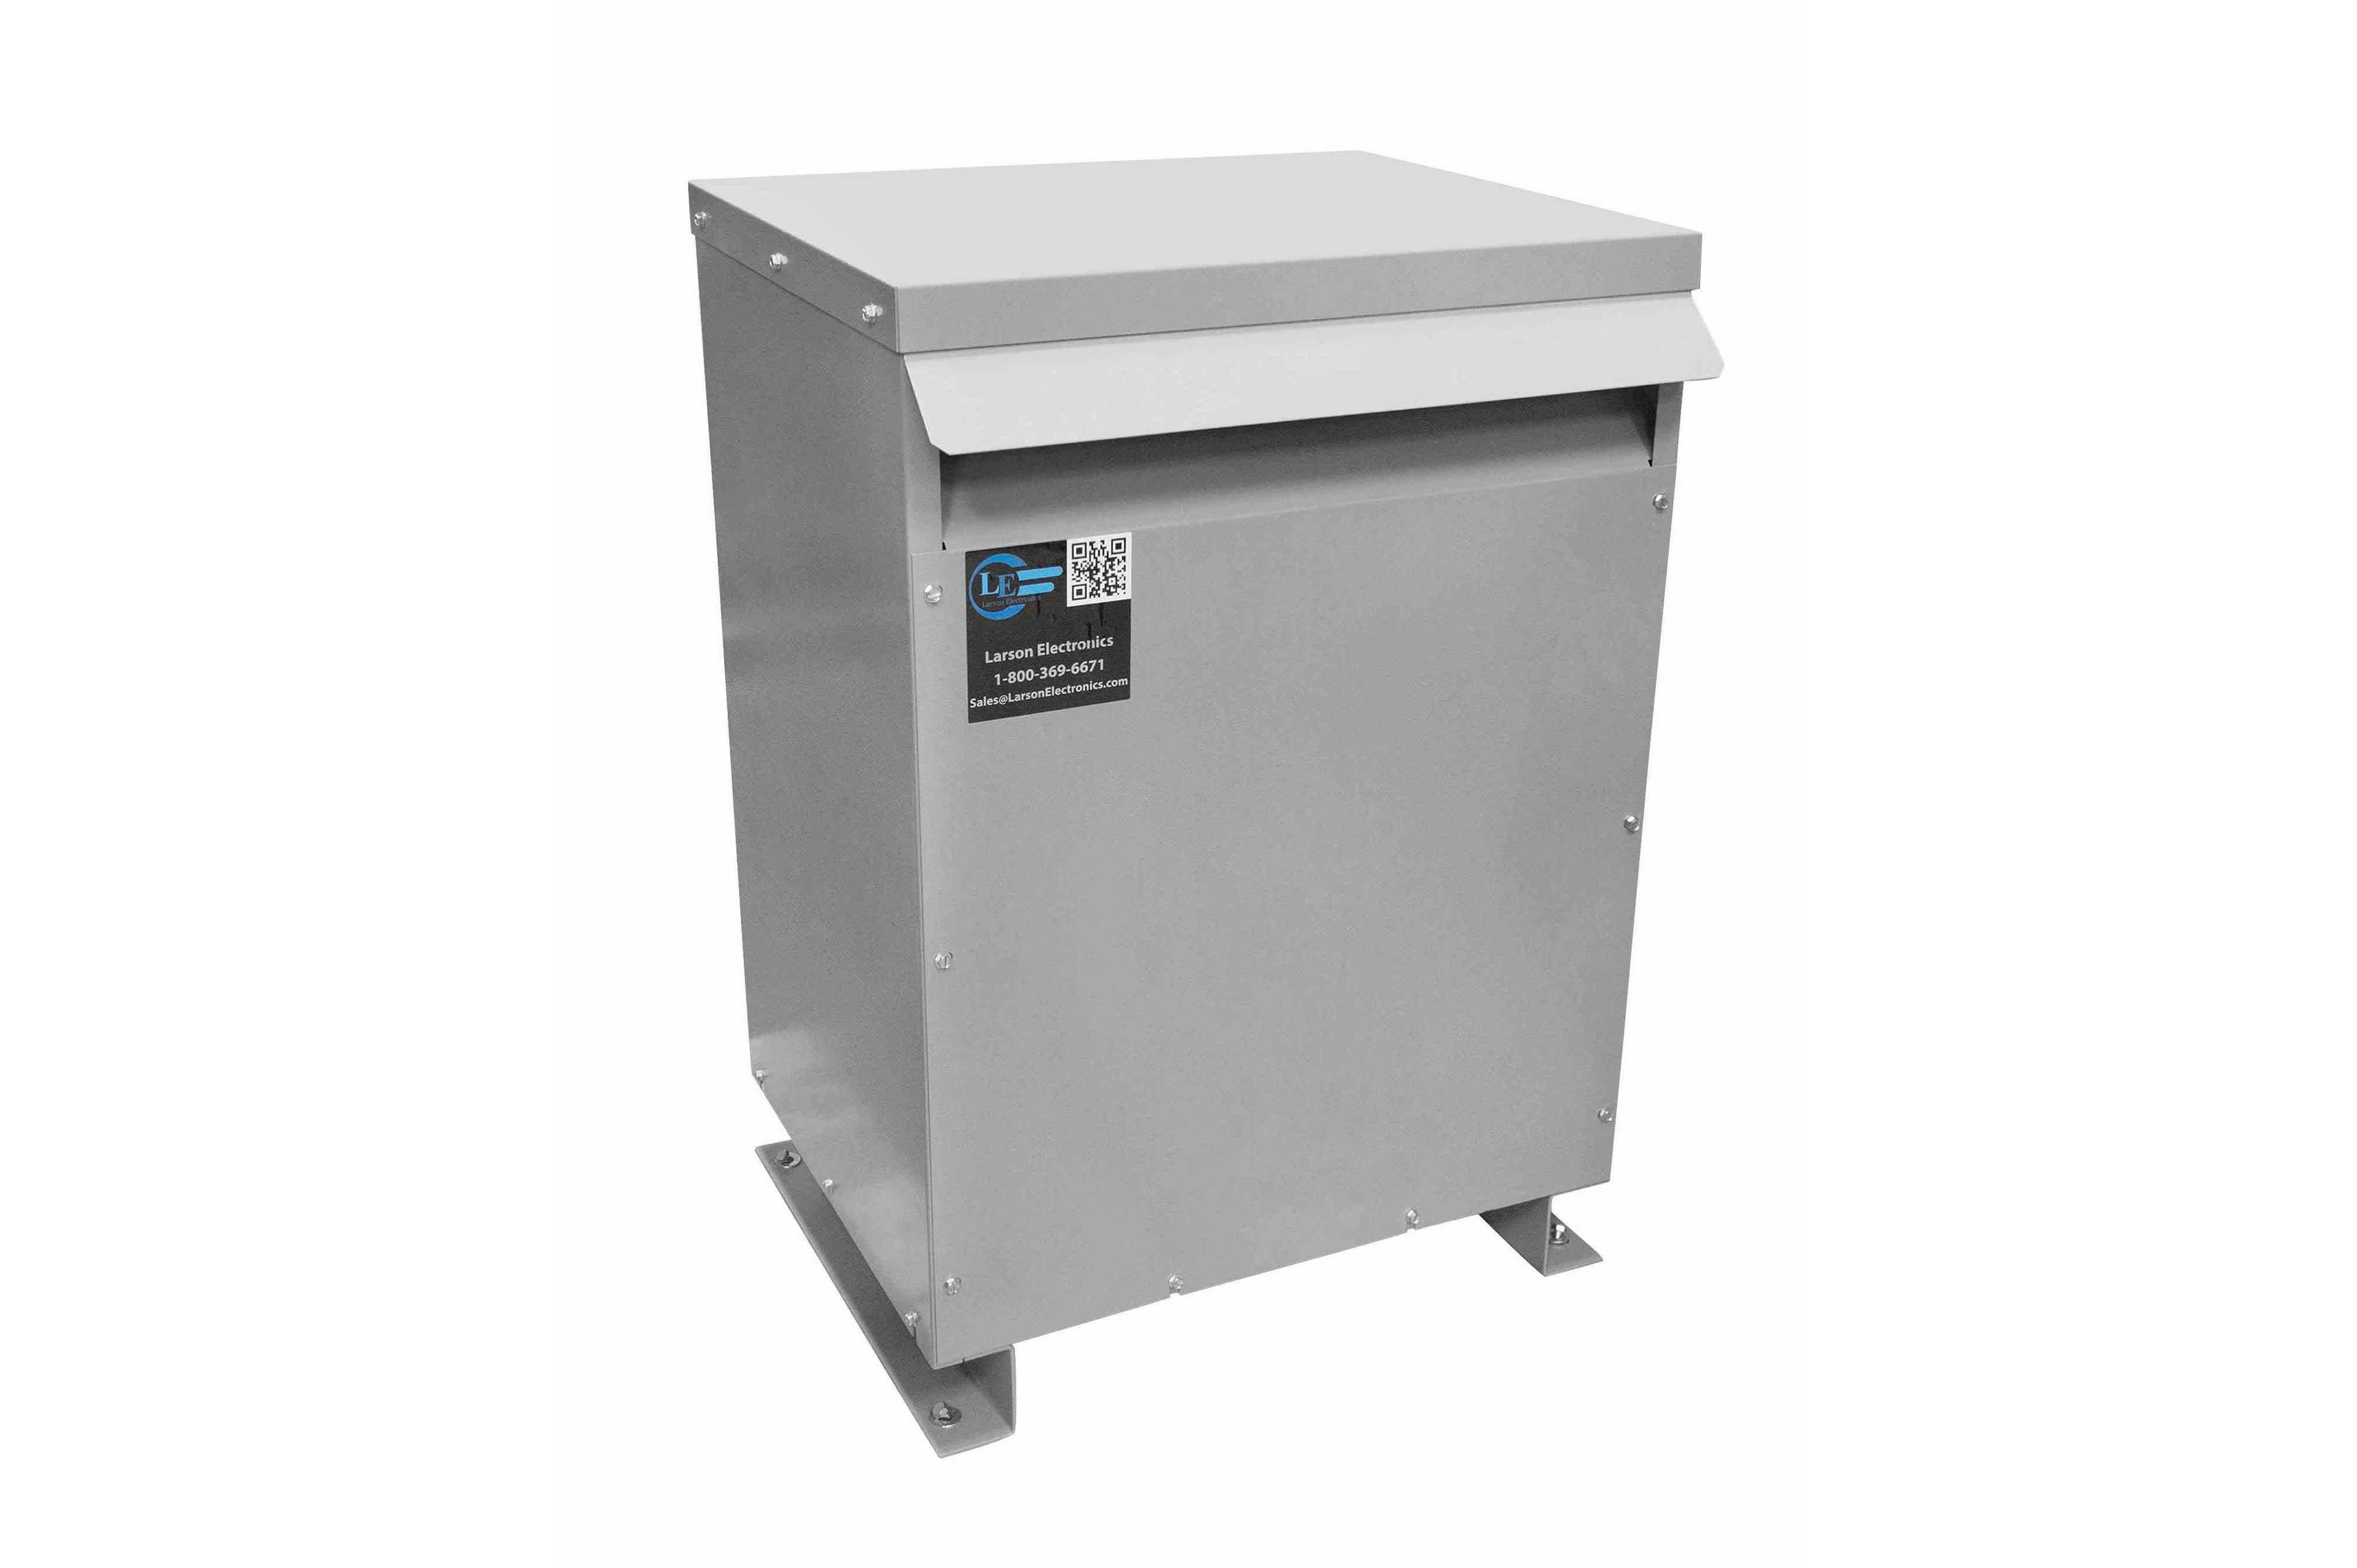 115 kVA 3PH Isolation Transformer, 415V Wye Primary, 480V Delta Secondary, N3R, Ventilated, 60 Hz